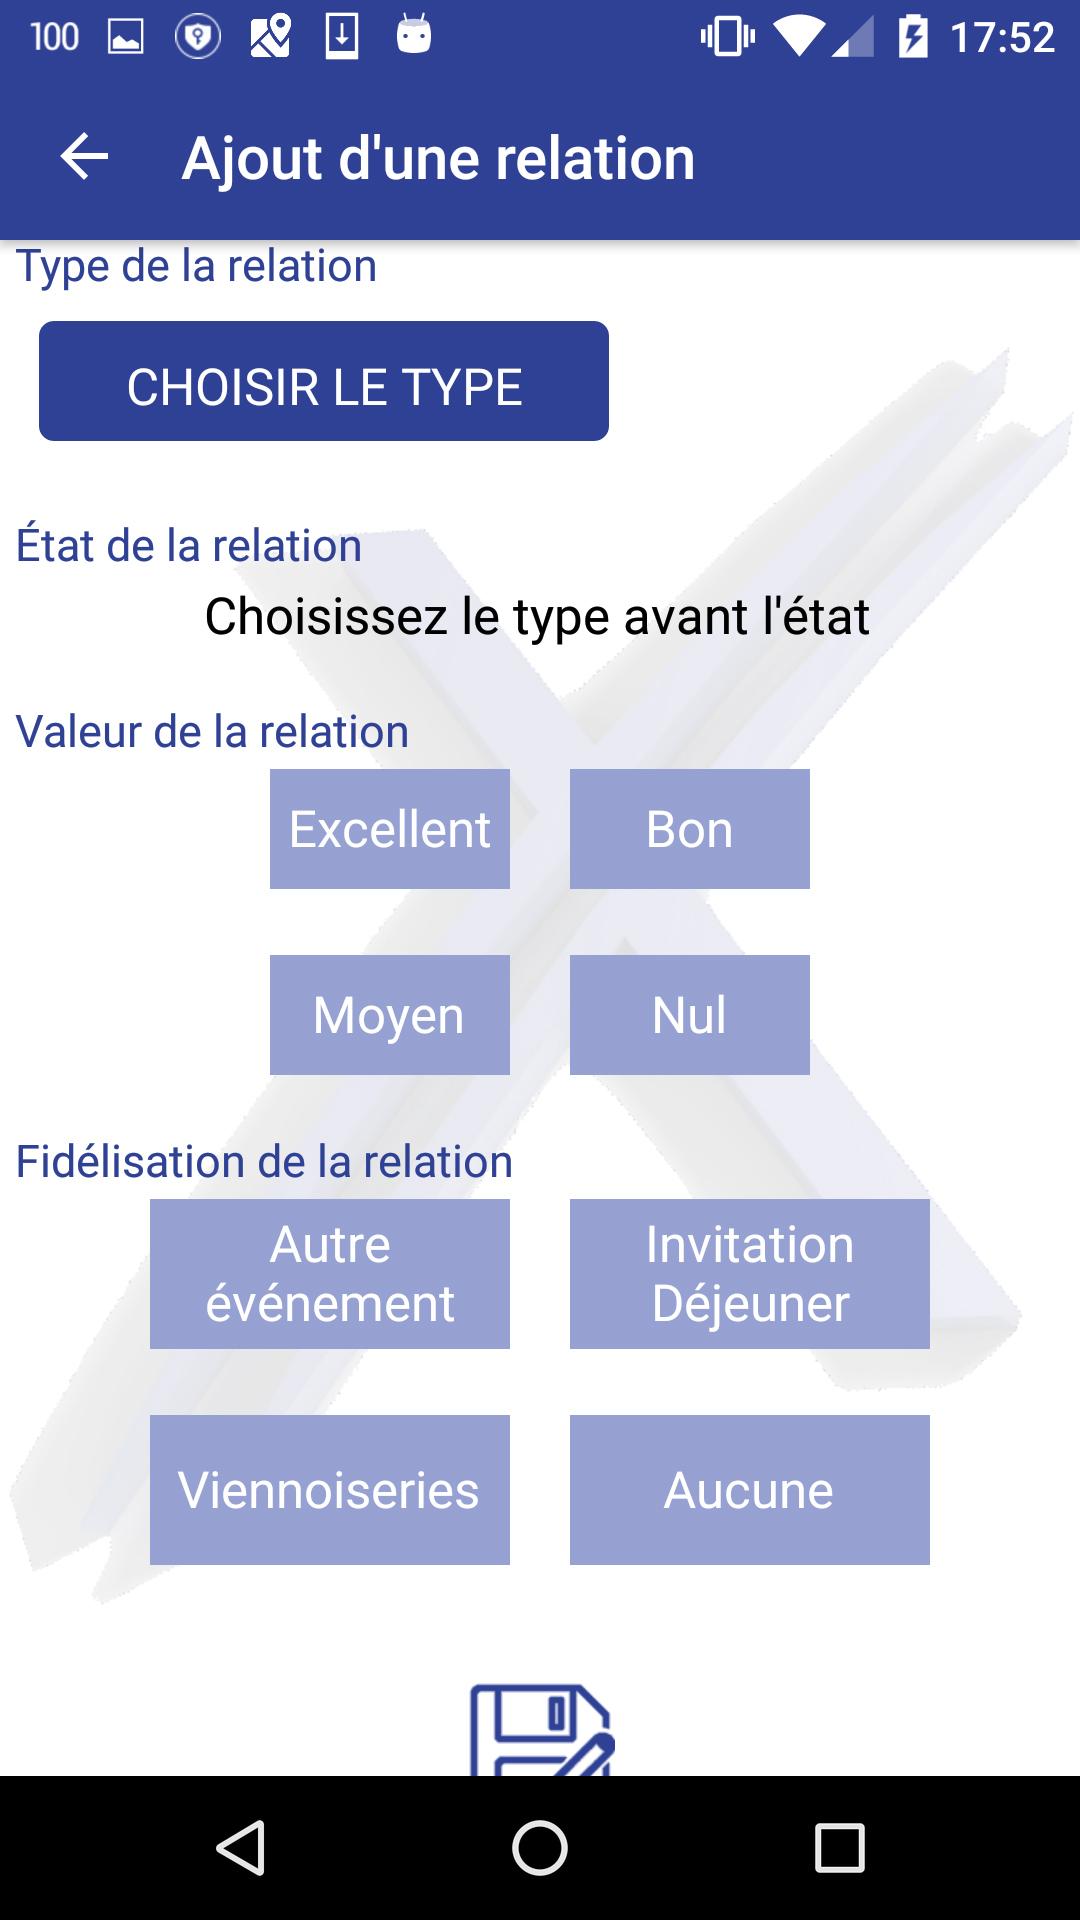 https://www.infopolis.fr/wp-content/uploads/2018/03/AppContact_Relation.jpg